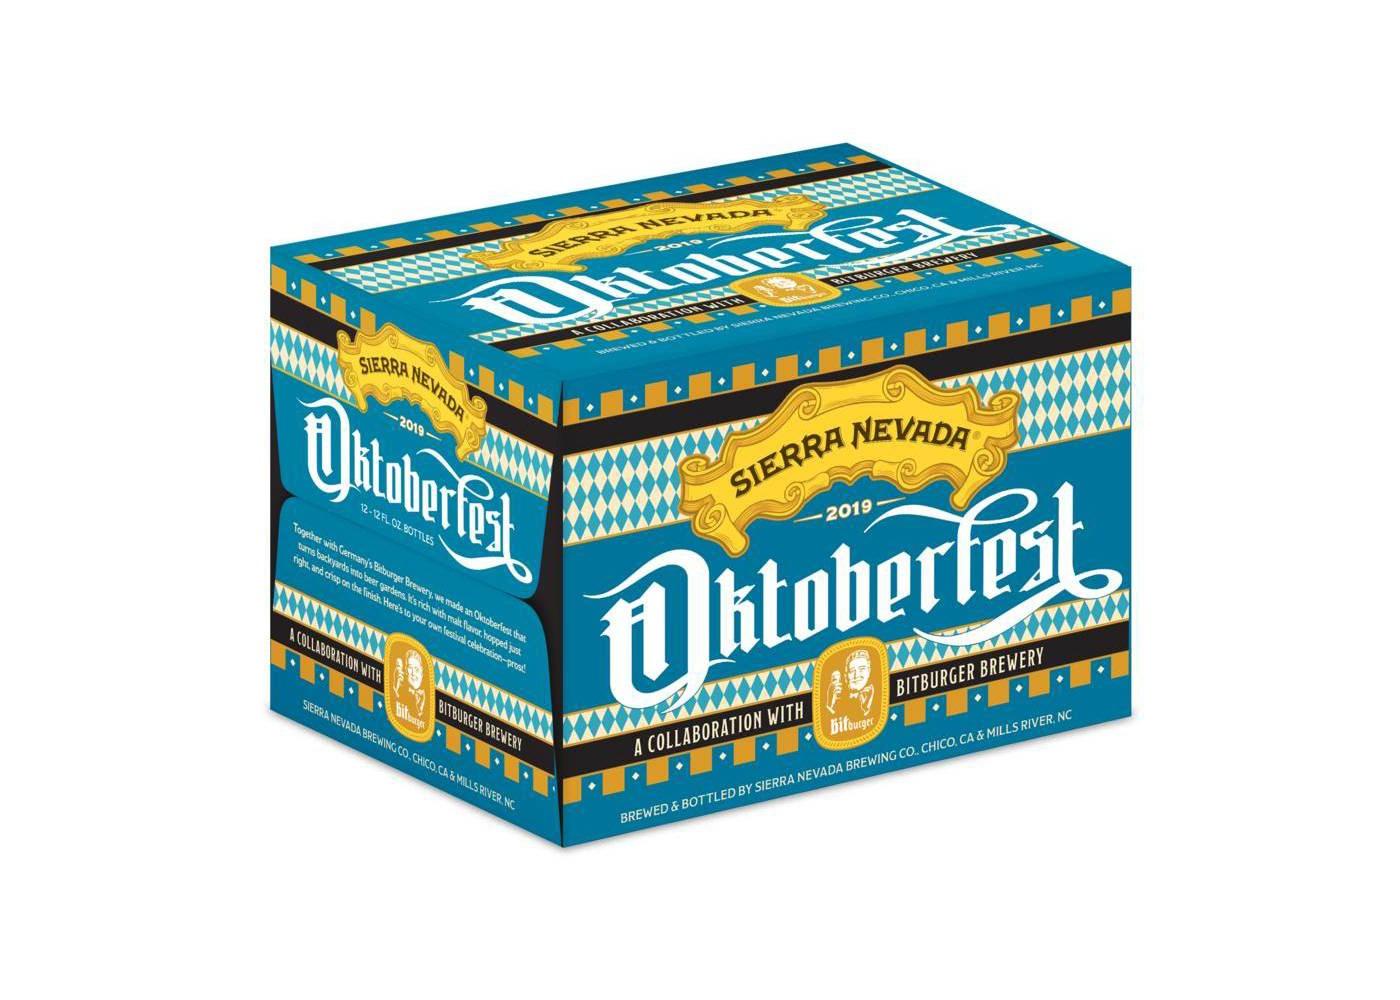 Sierra Nevada Brewing and Bittburger Brewery 2019 Oktoberfest Beer